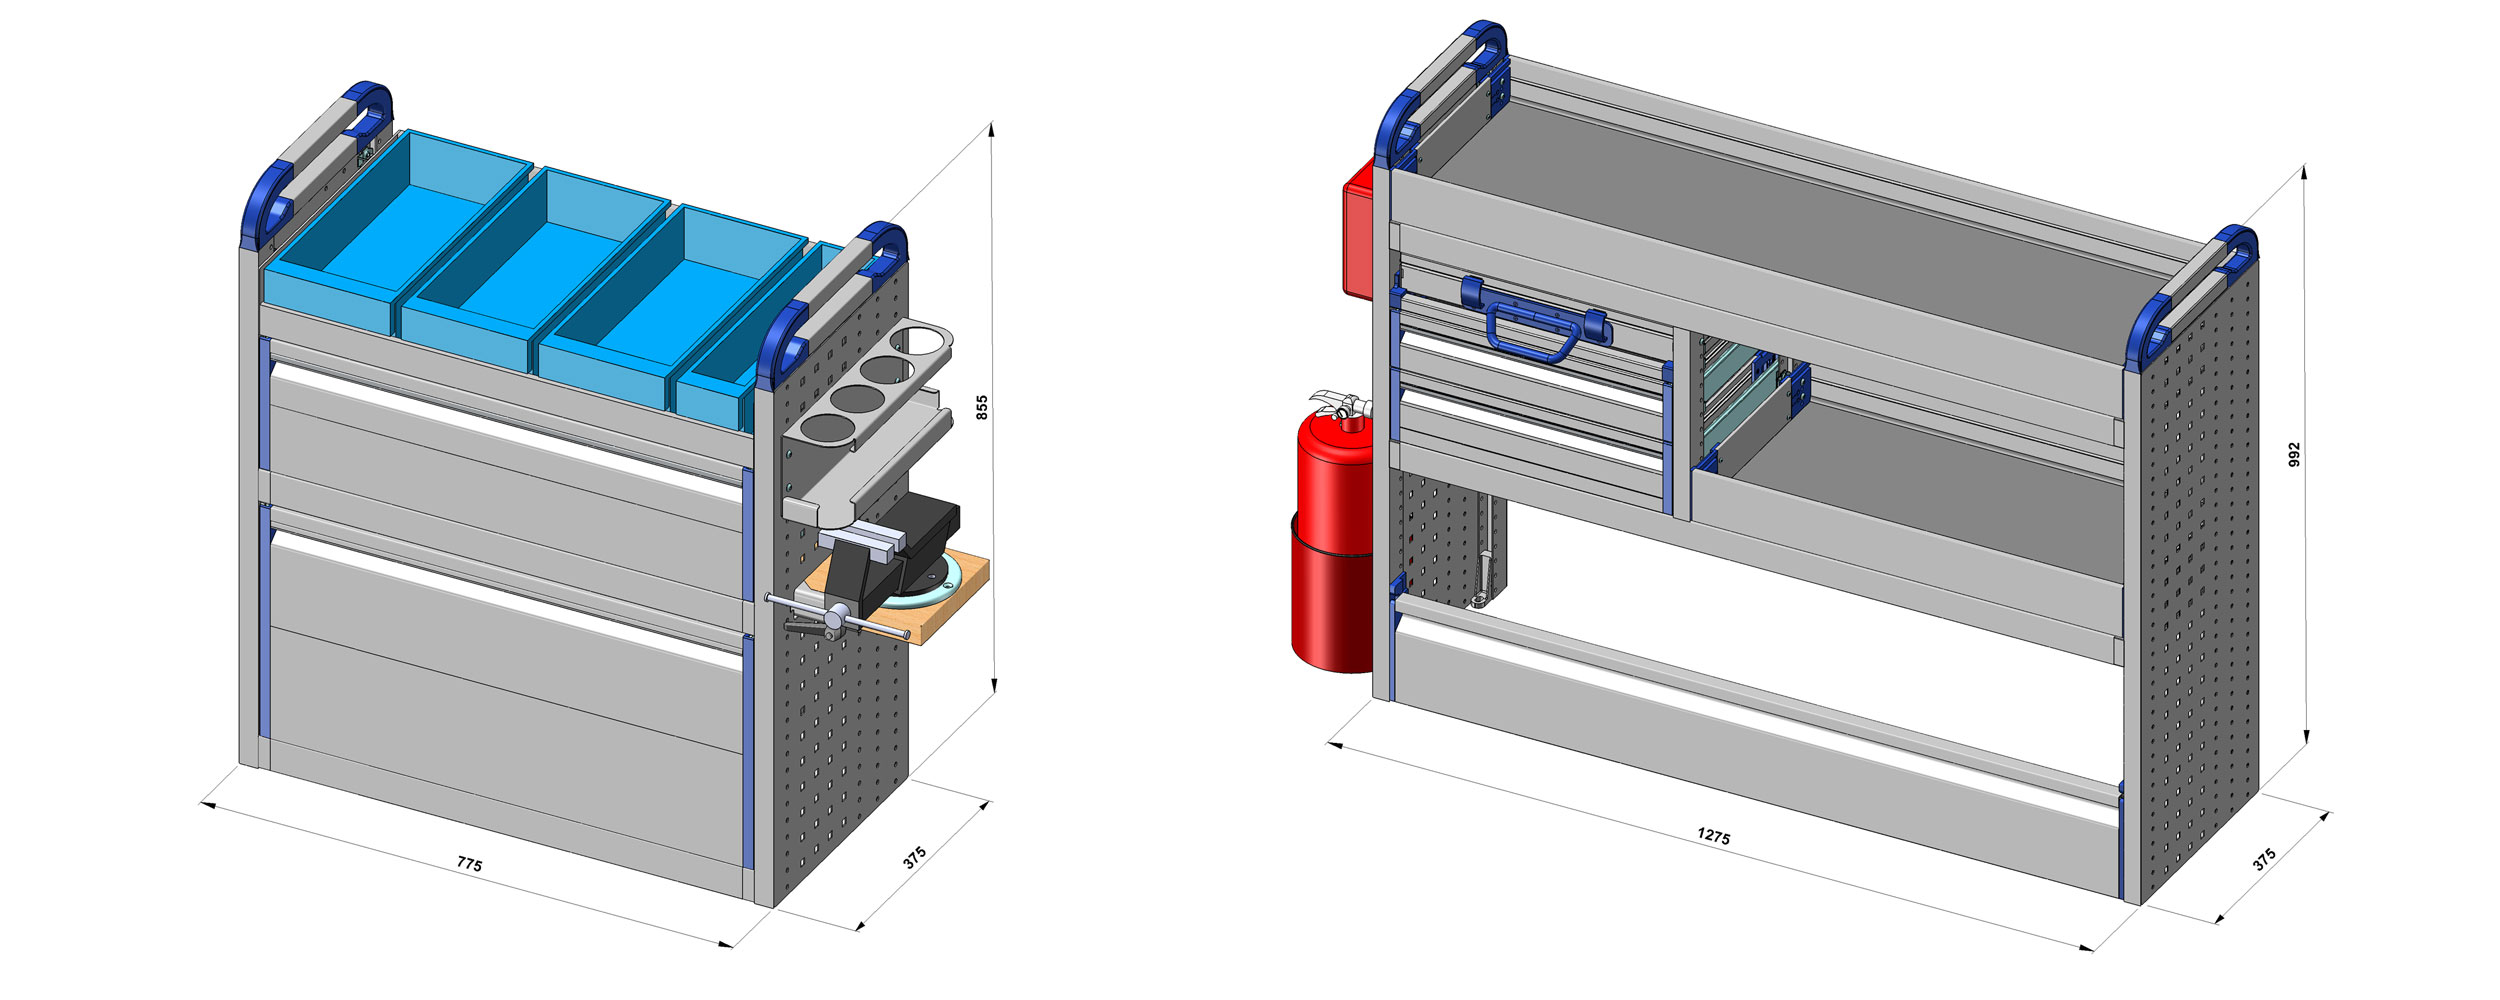 dibujos técnicos furgonetas taller movil estandar